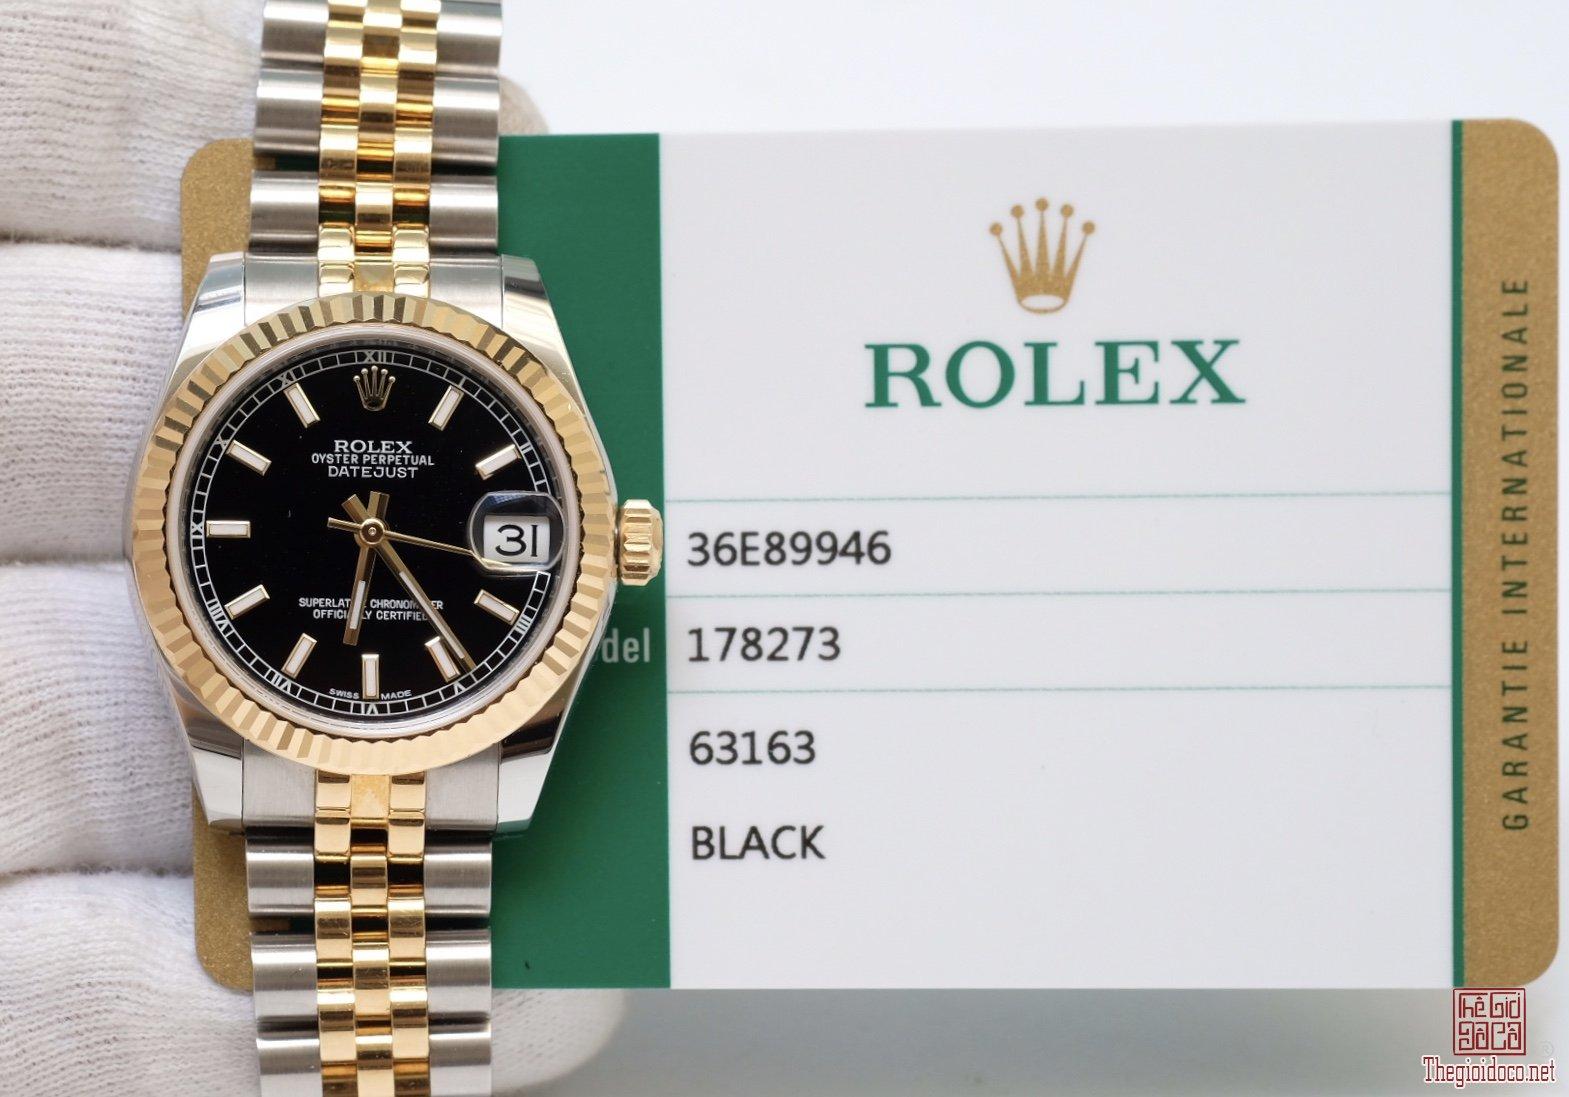 Đồng hồ nữ Rolex DateJust 178273 Demi vàng 18k, mặt đen size 31mm